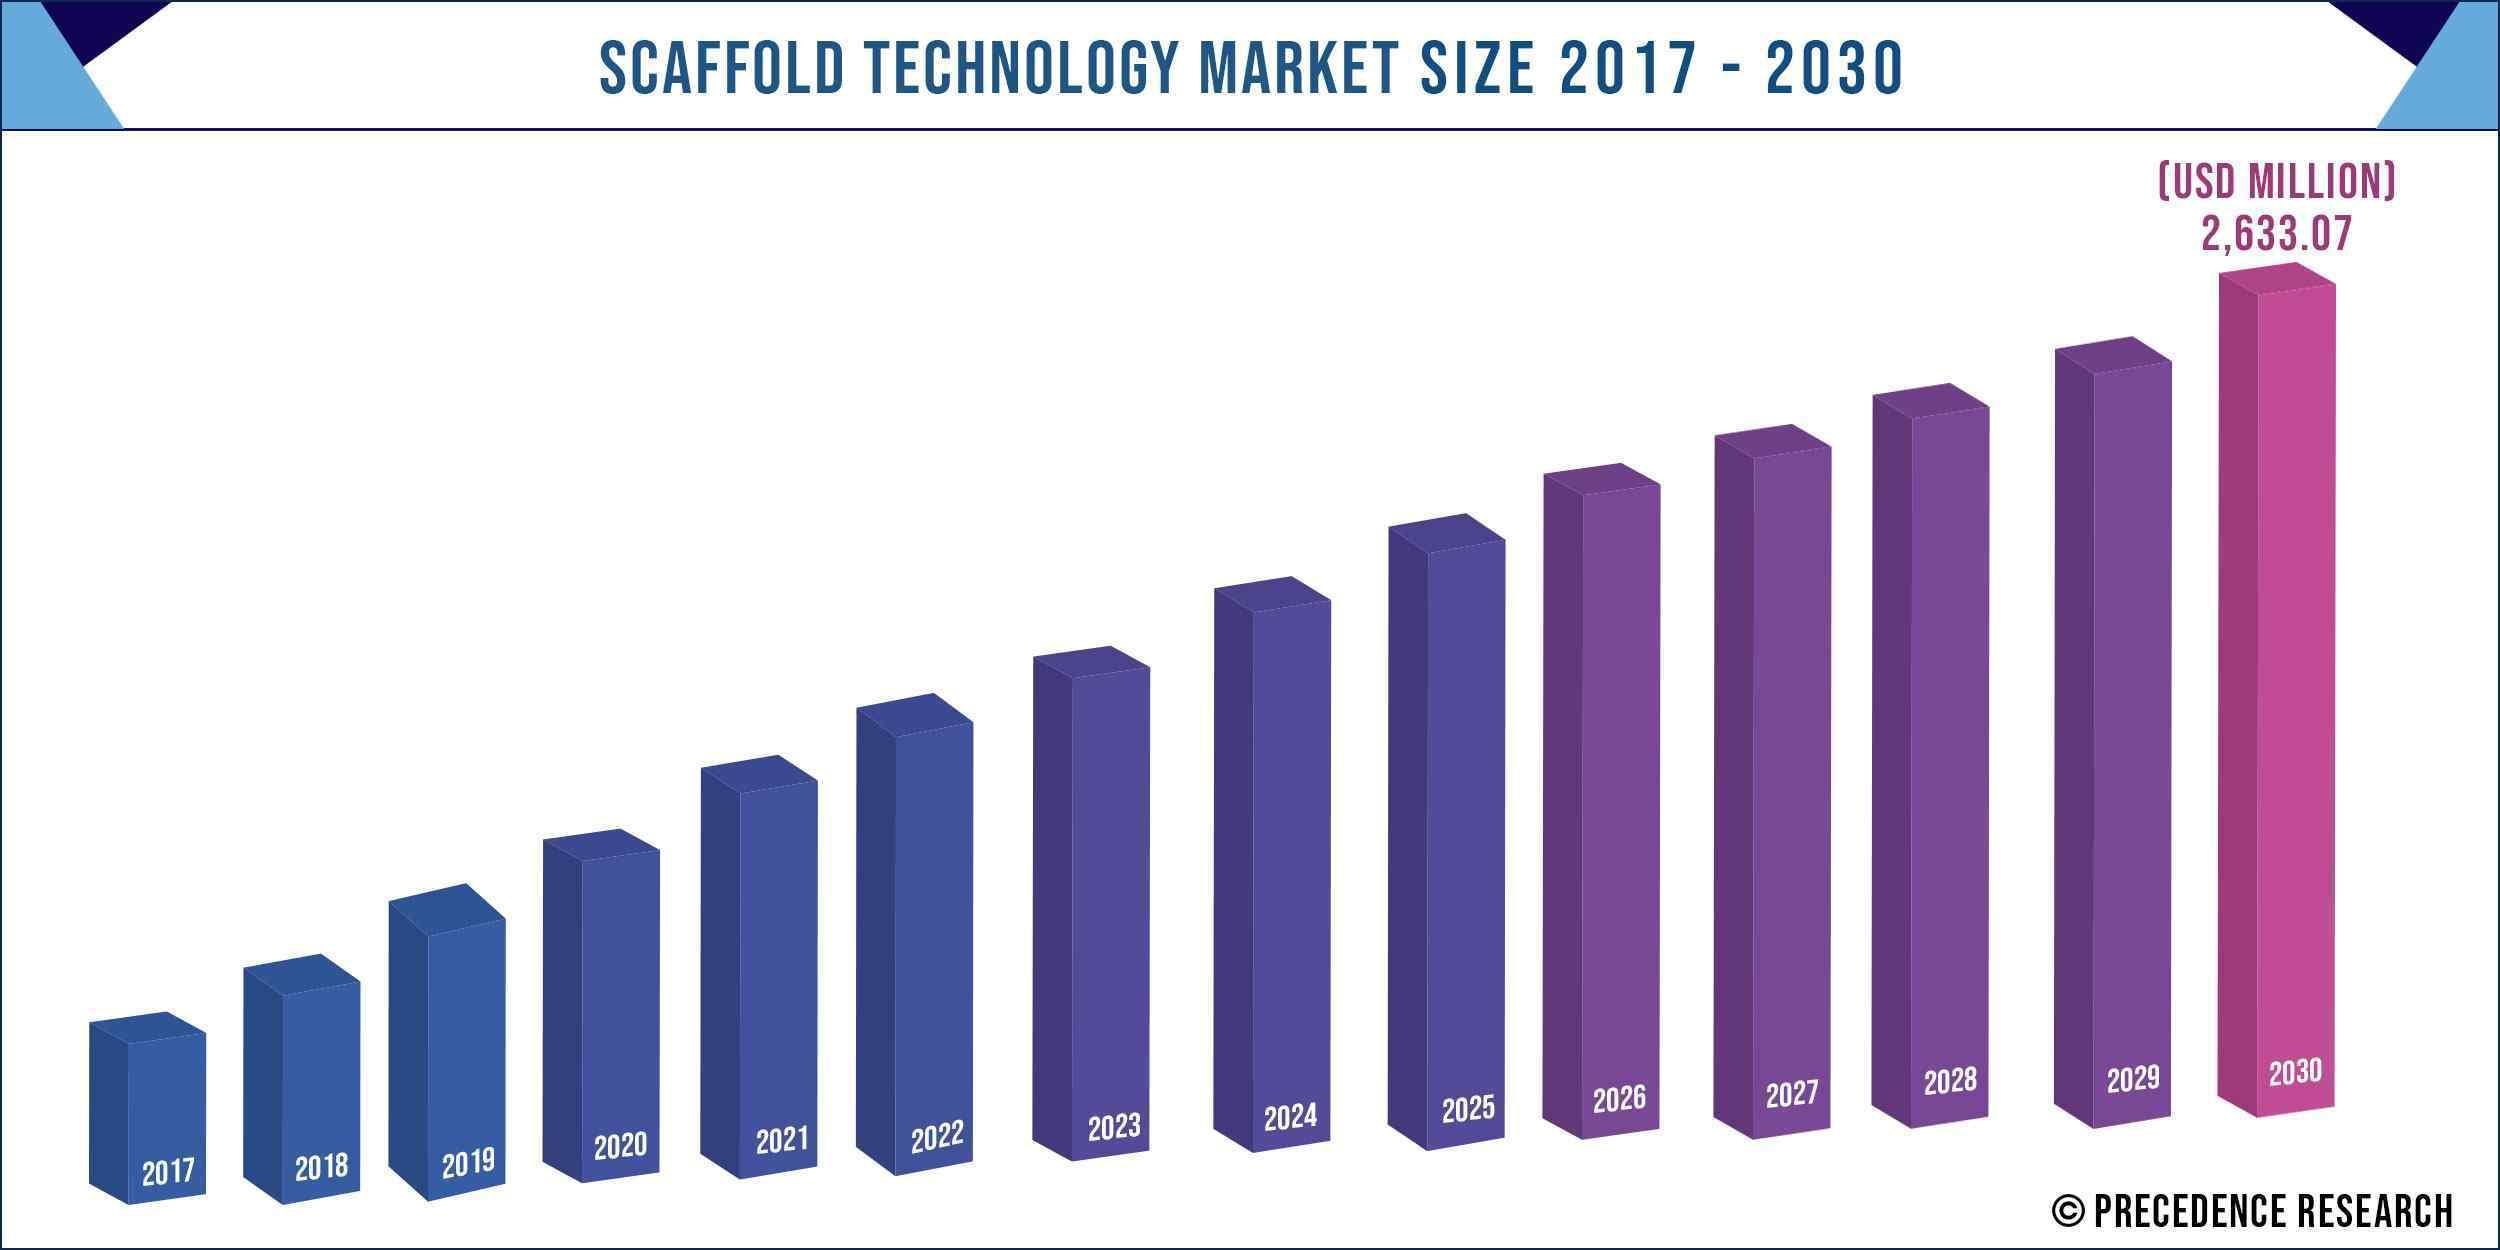 Scaffold Technology Market Size 2017 to 2030